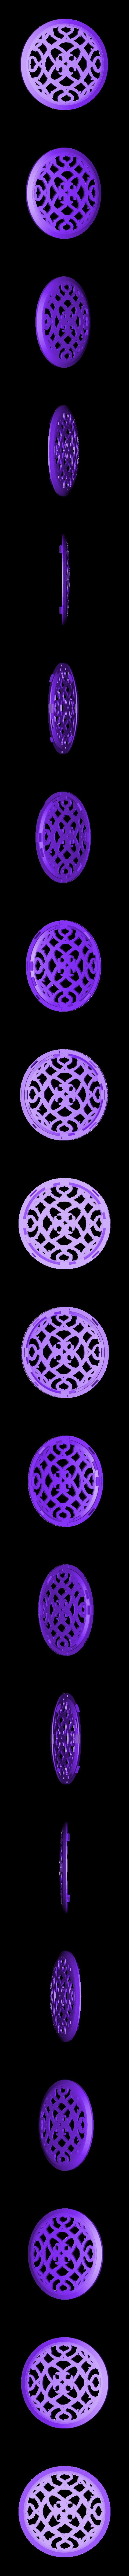 hp espace 4(1).stl Download STL file hp grid renault space 4 • 3D print design, 3D-XYZ